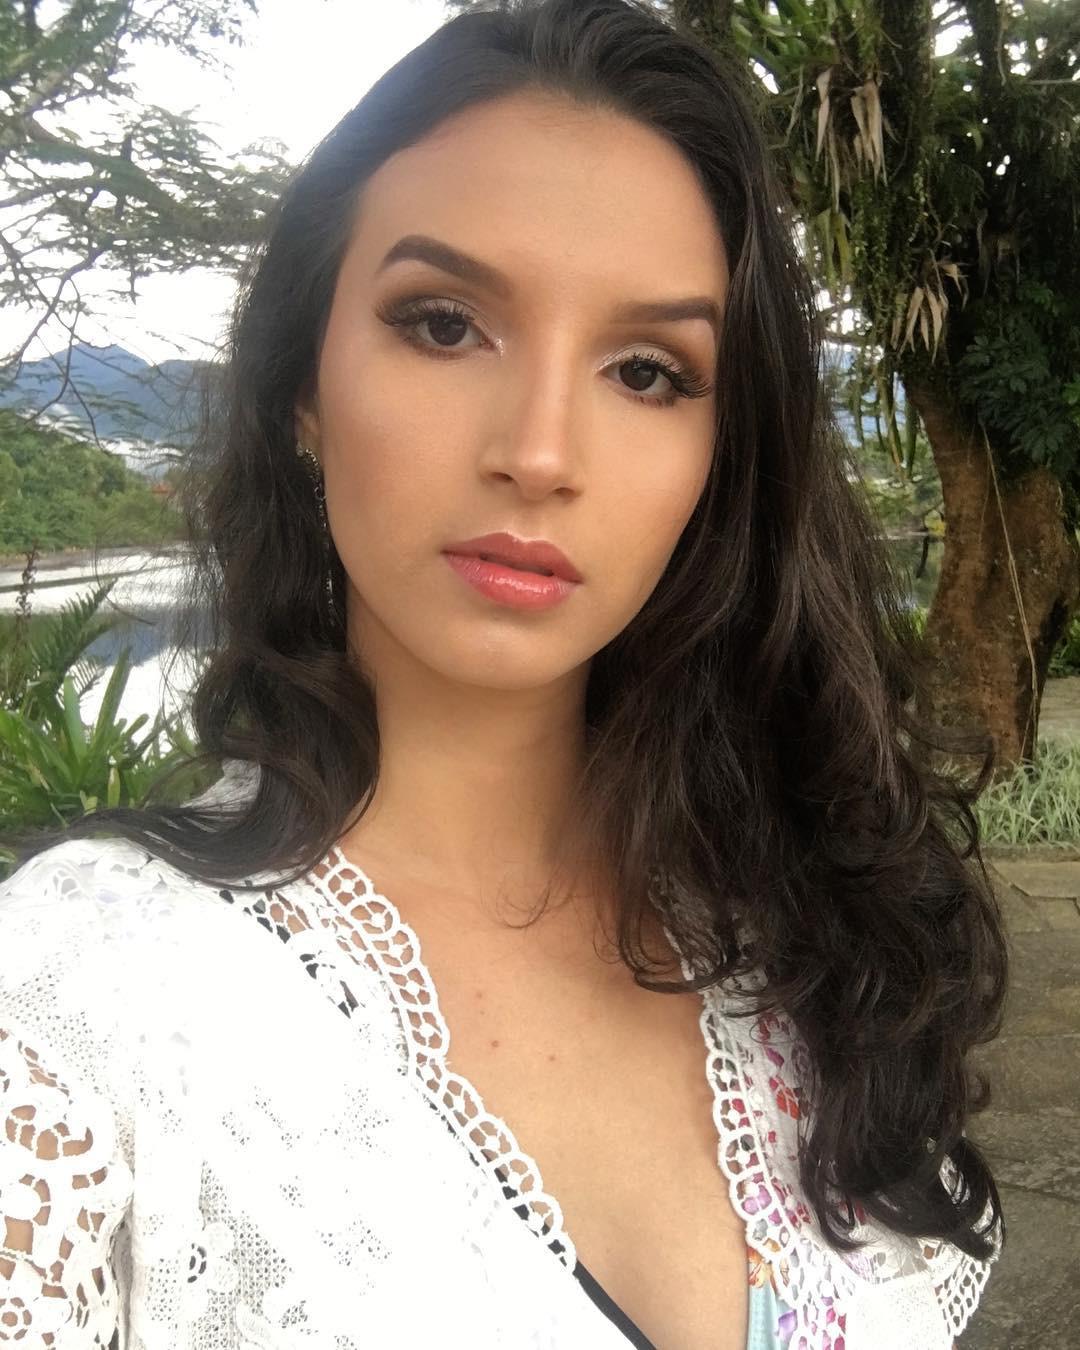 isabella garcia, top 8 de miss brasil mundo 2018/top 20 de miss brasil mundo 2019. - Página 3 Bjegjr10